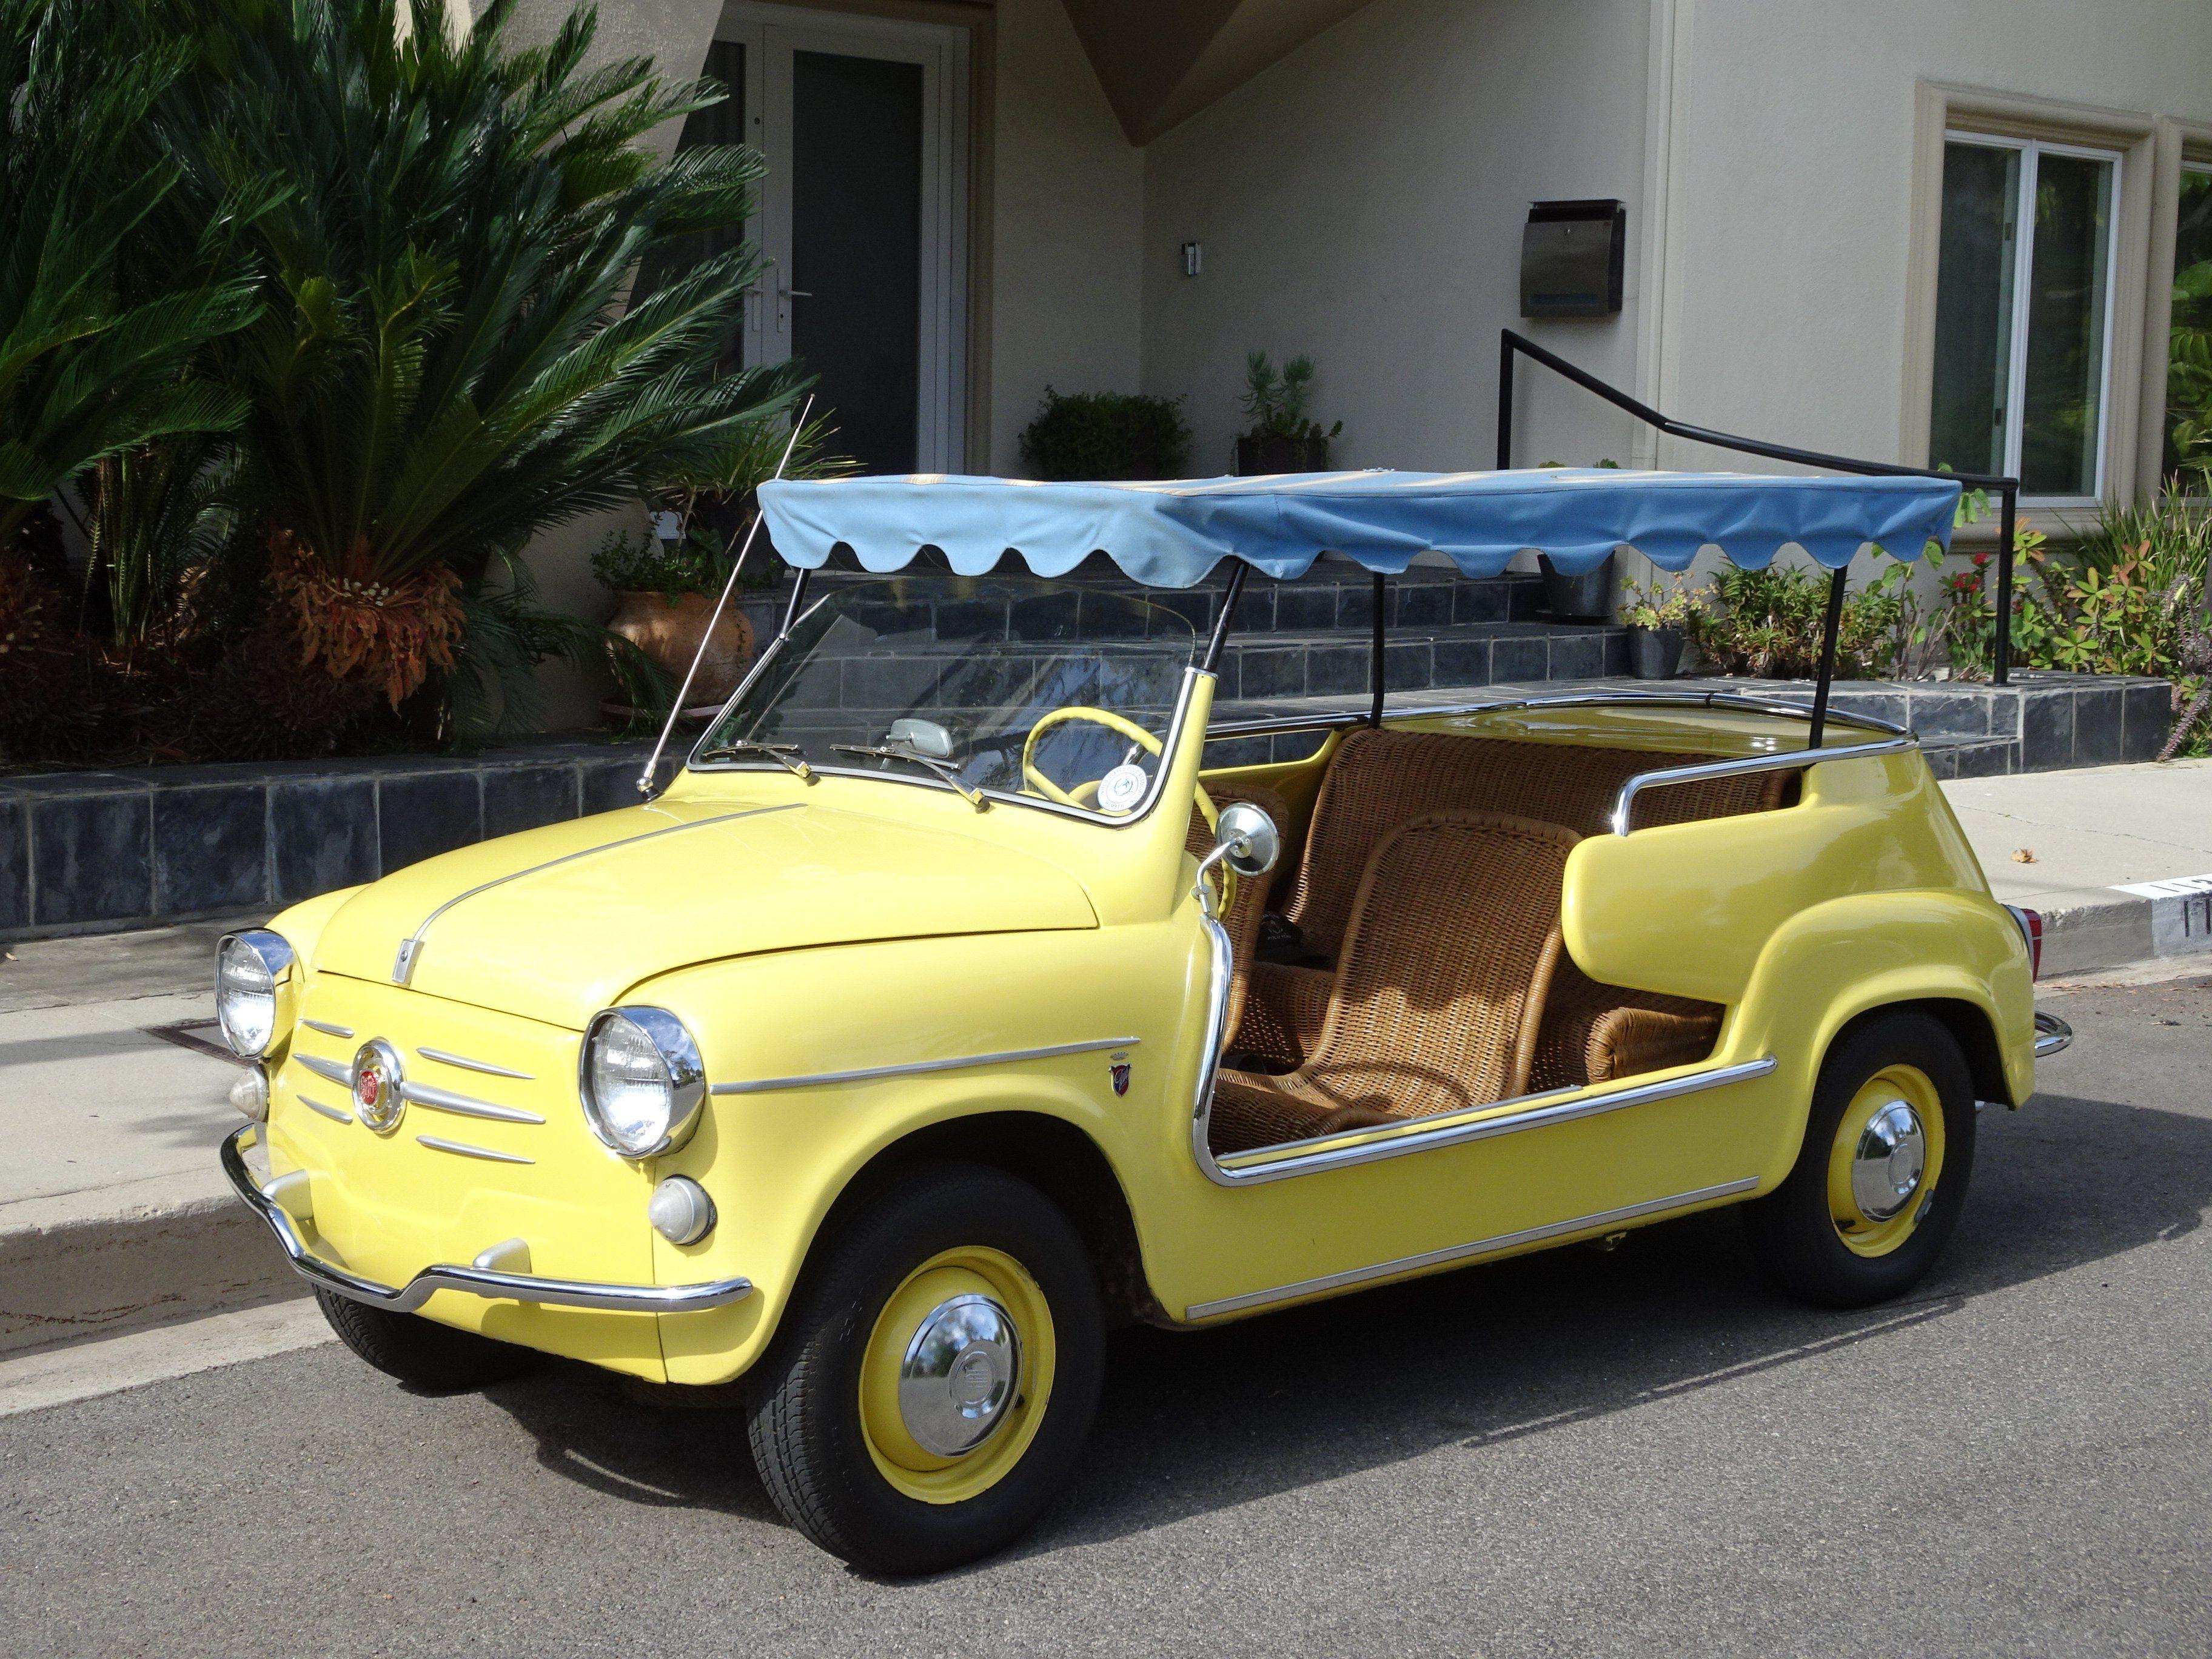 1959 Fiat 600 Spiaggina Jolly Beach Car